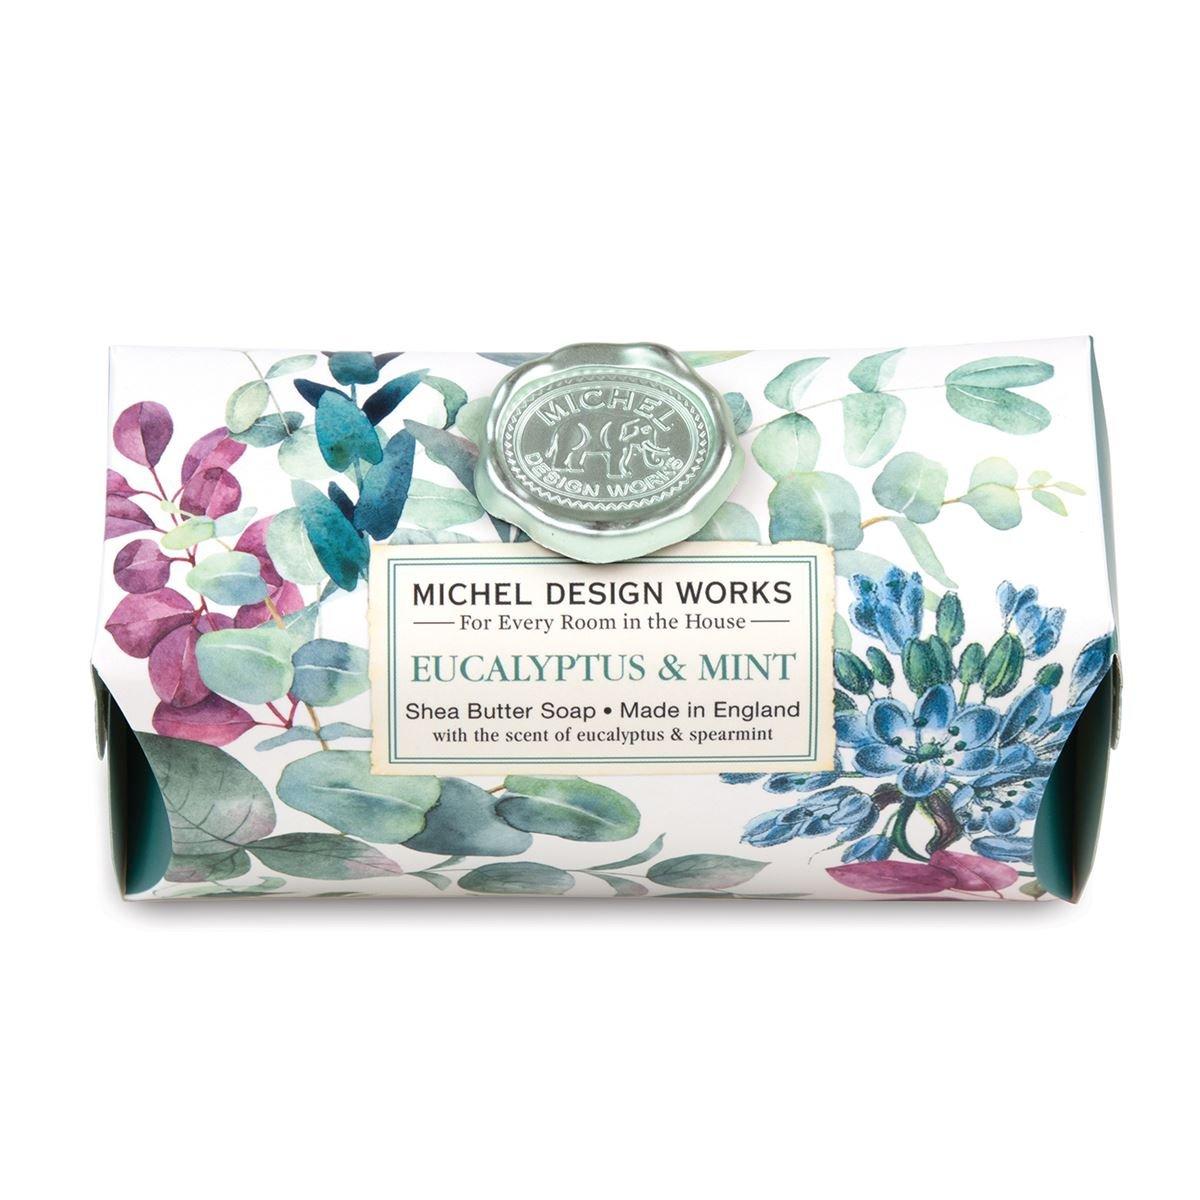 Eucalyptus & Mint Large Bath Soap Bar